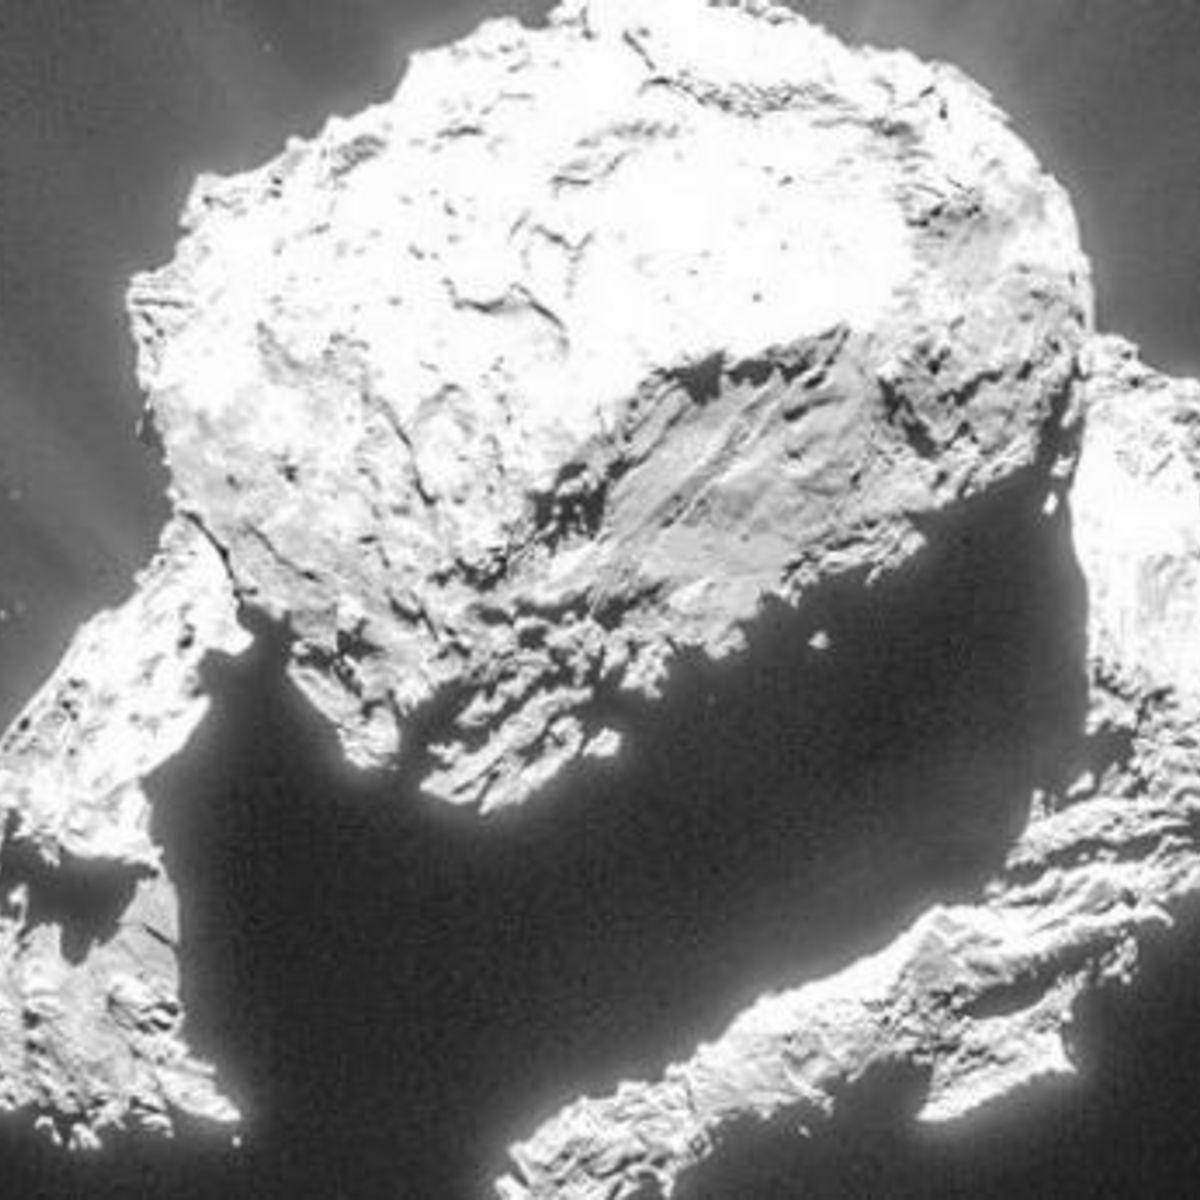 rosetta_comet_mar92015.jpg.CROP.rectangle-large_0.jpg